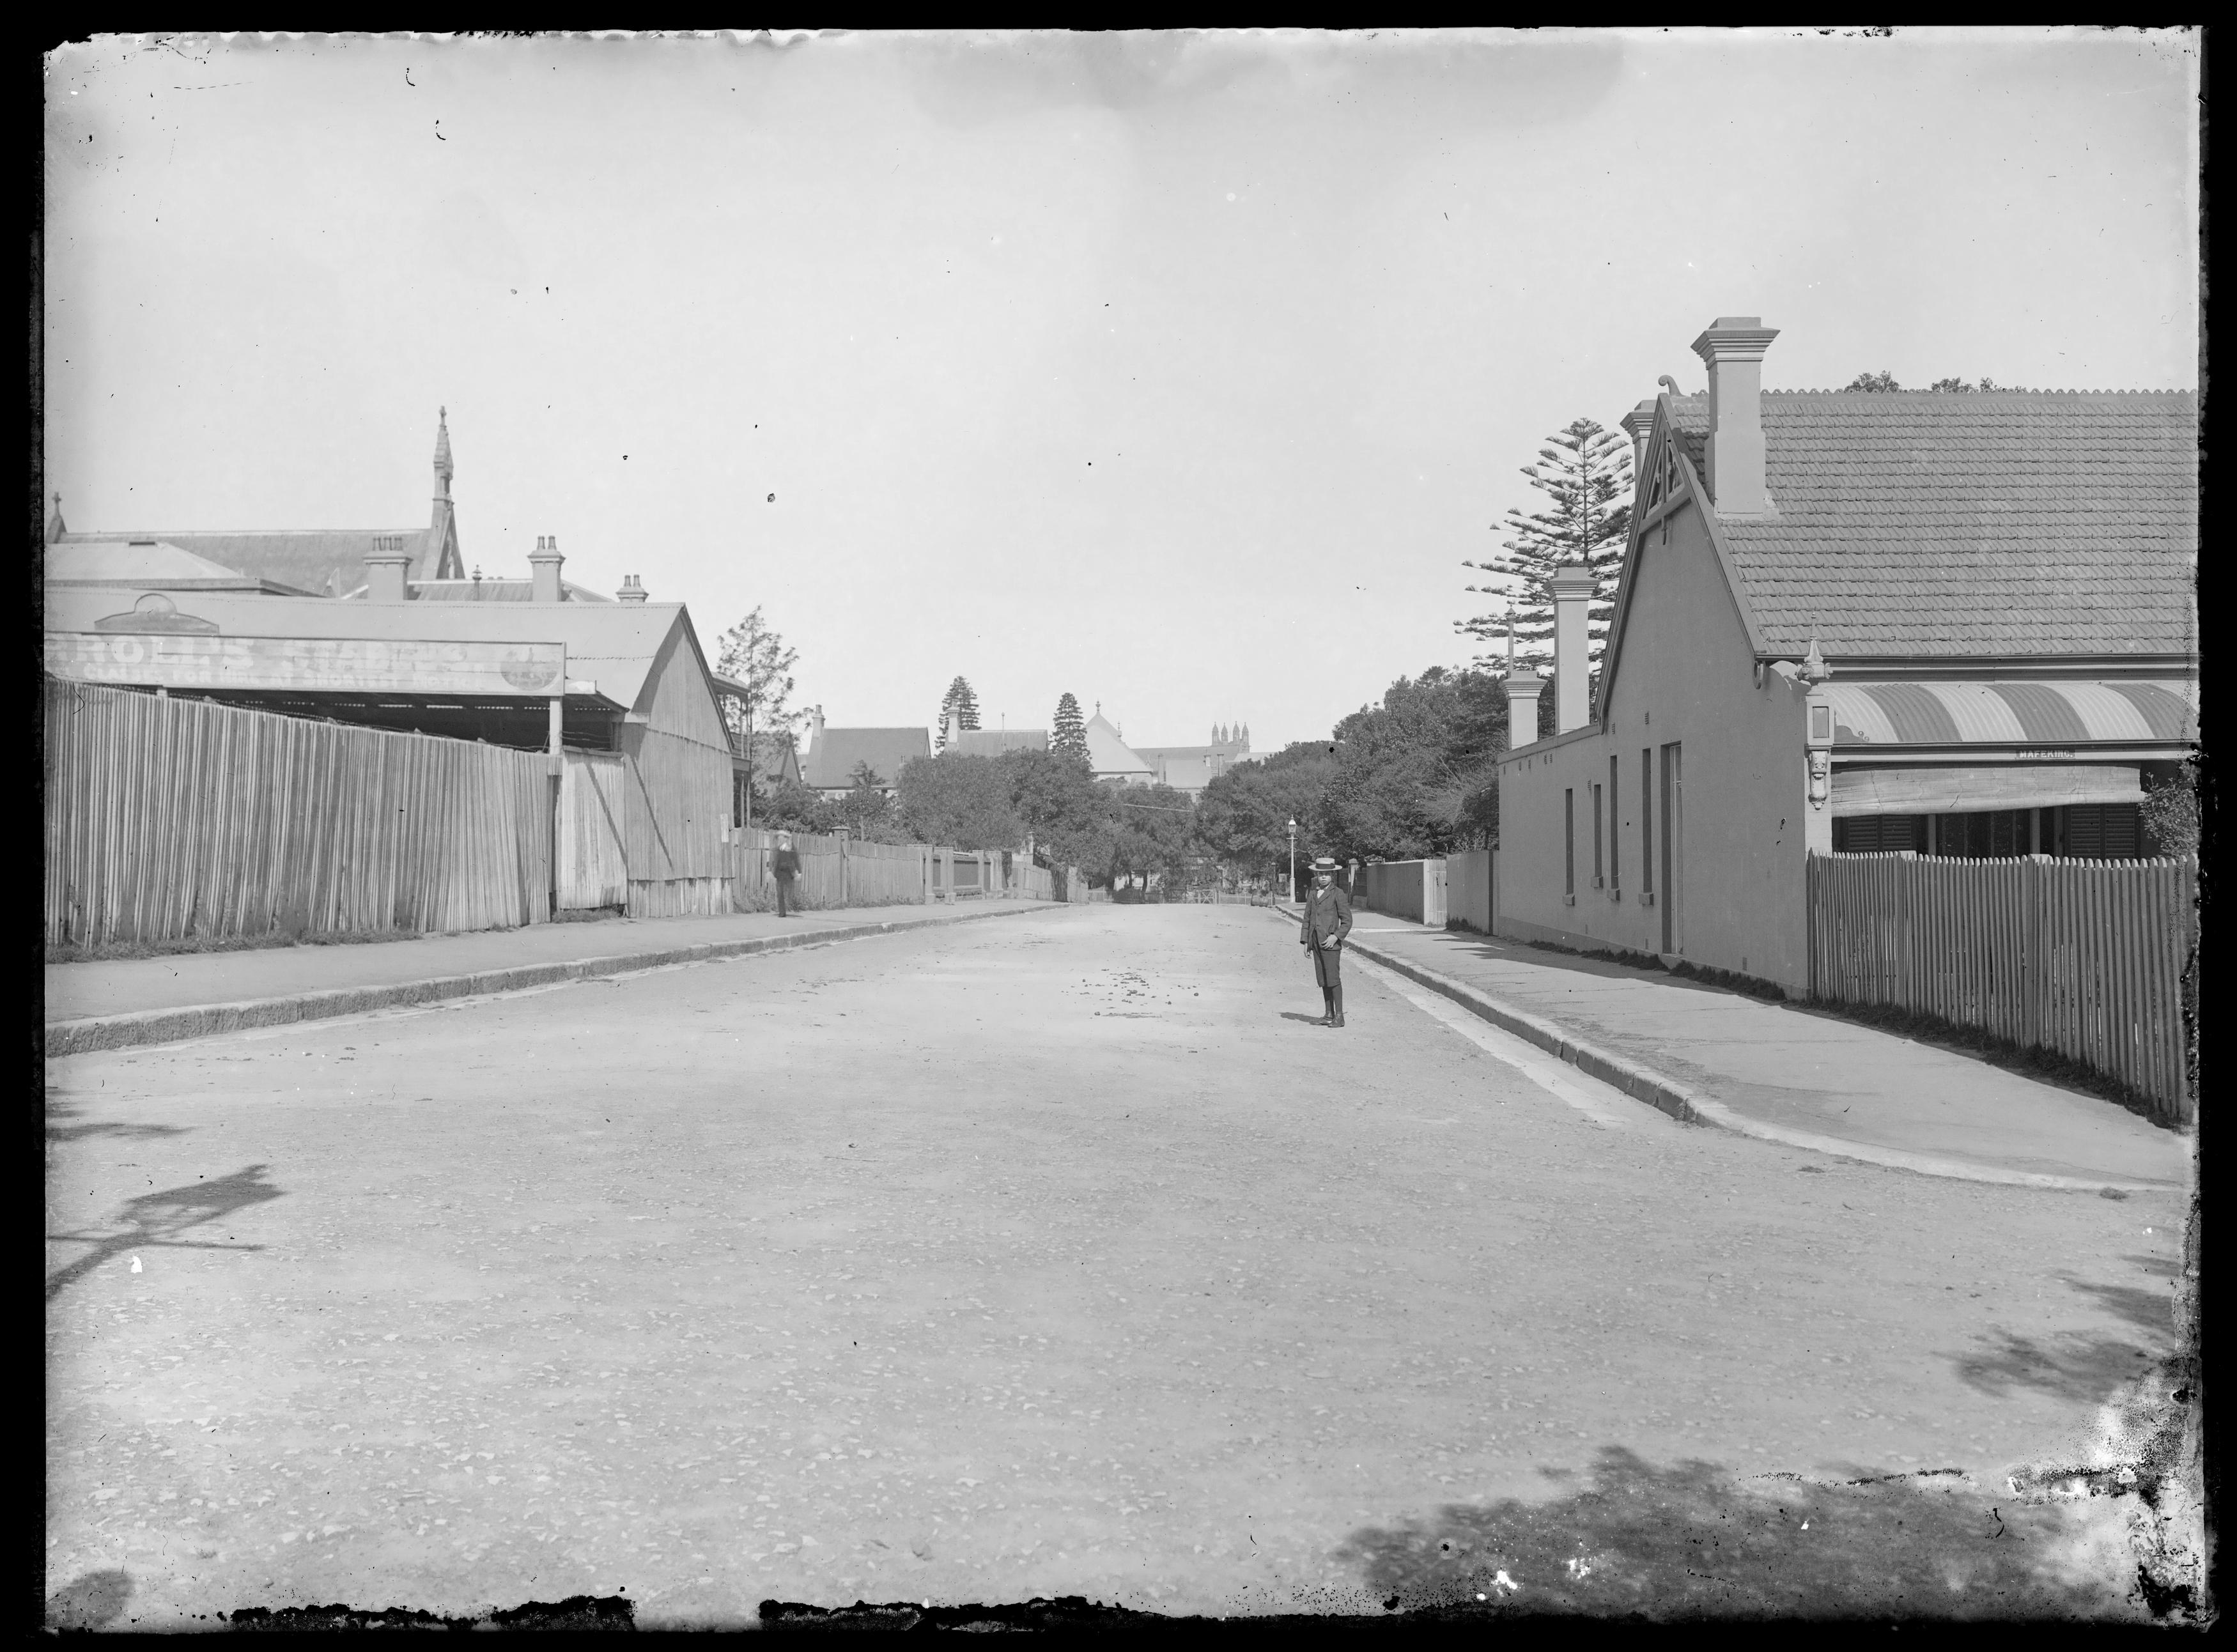 Views of Rotorua, New Zealand, and some of Sydney, ca. 1890-1910, by William Joseph Macpherson